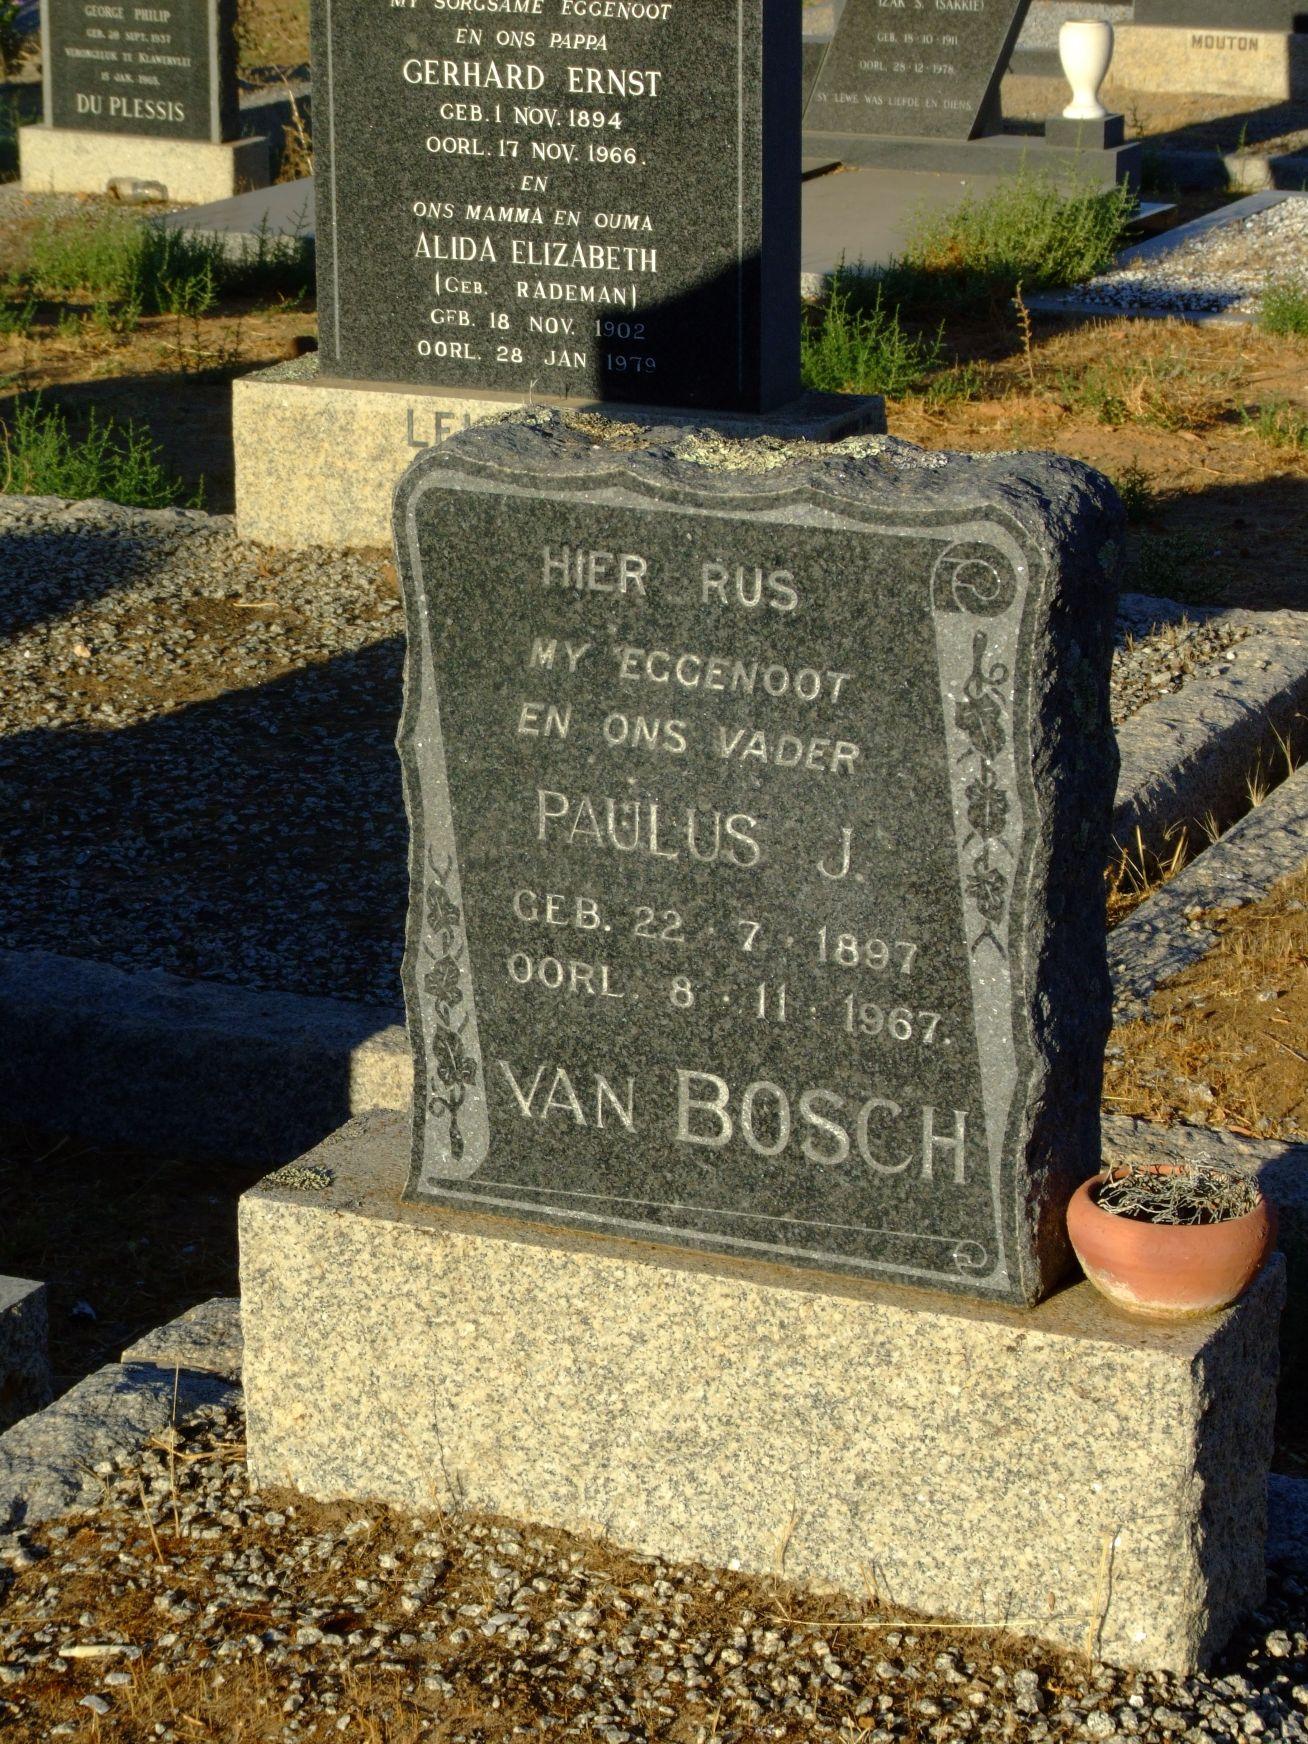 Van Bosch, Paulus J.